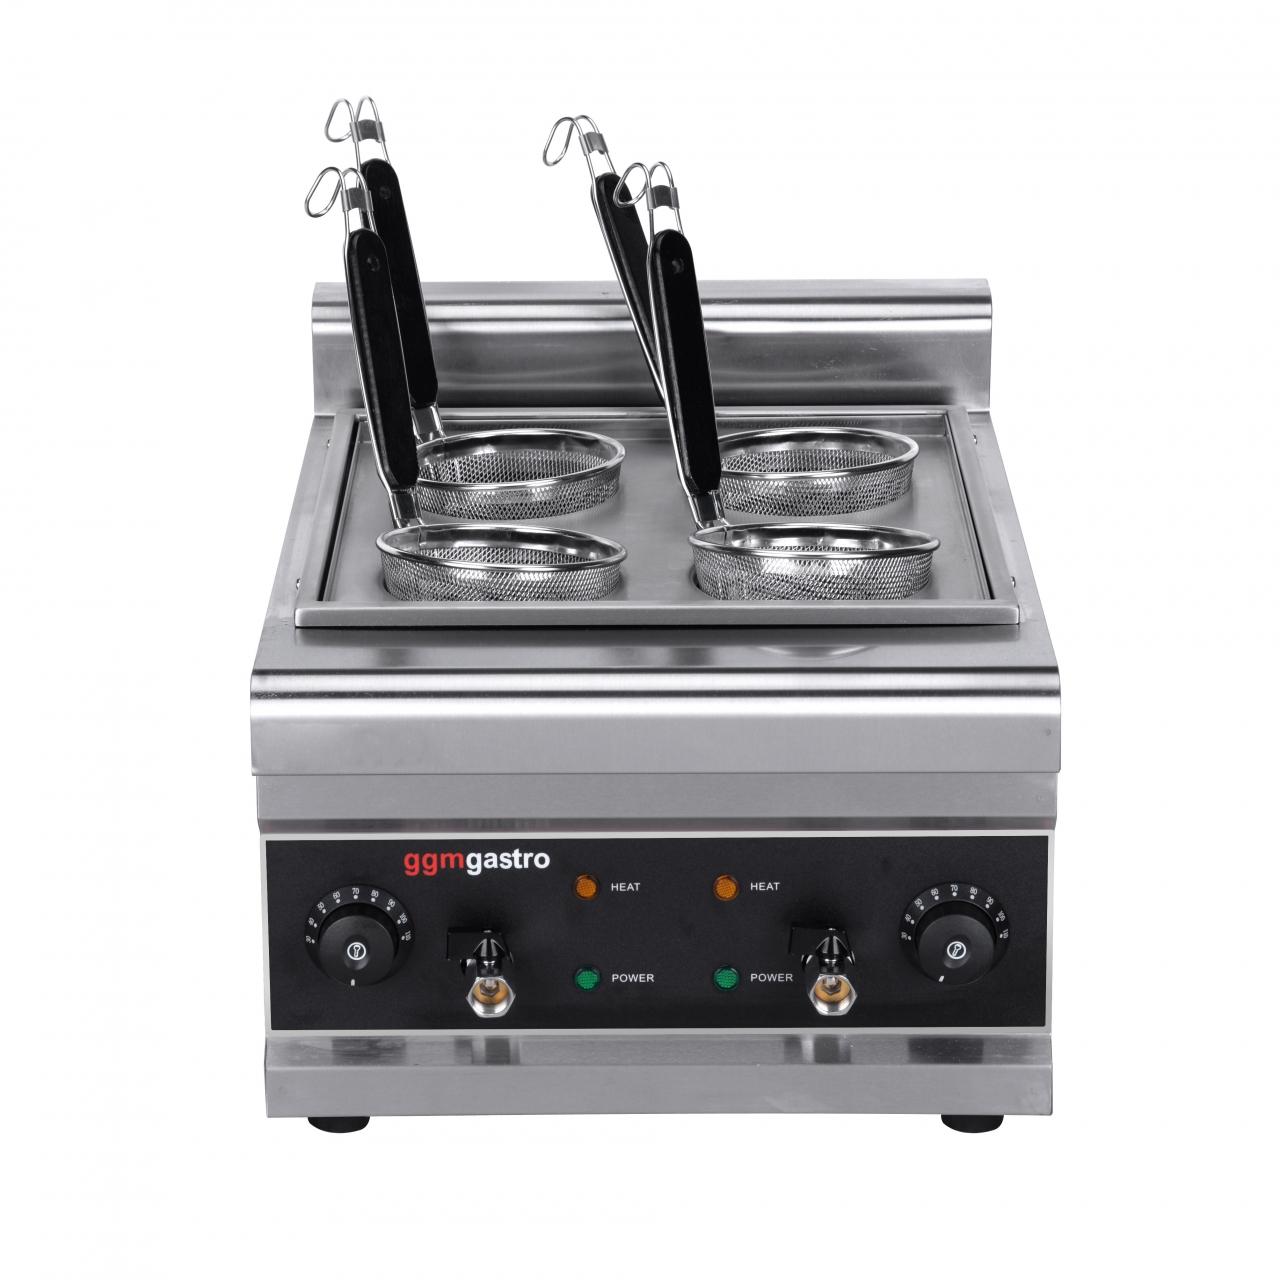 Pasta cooker 4 sieves